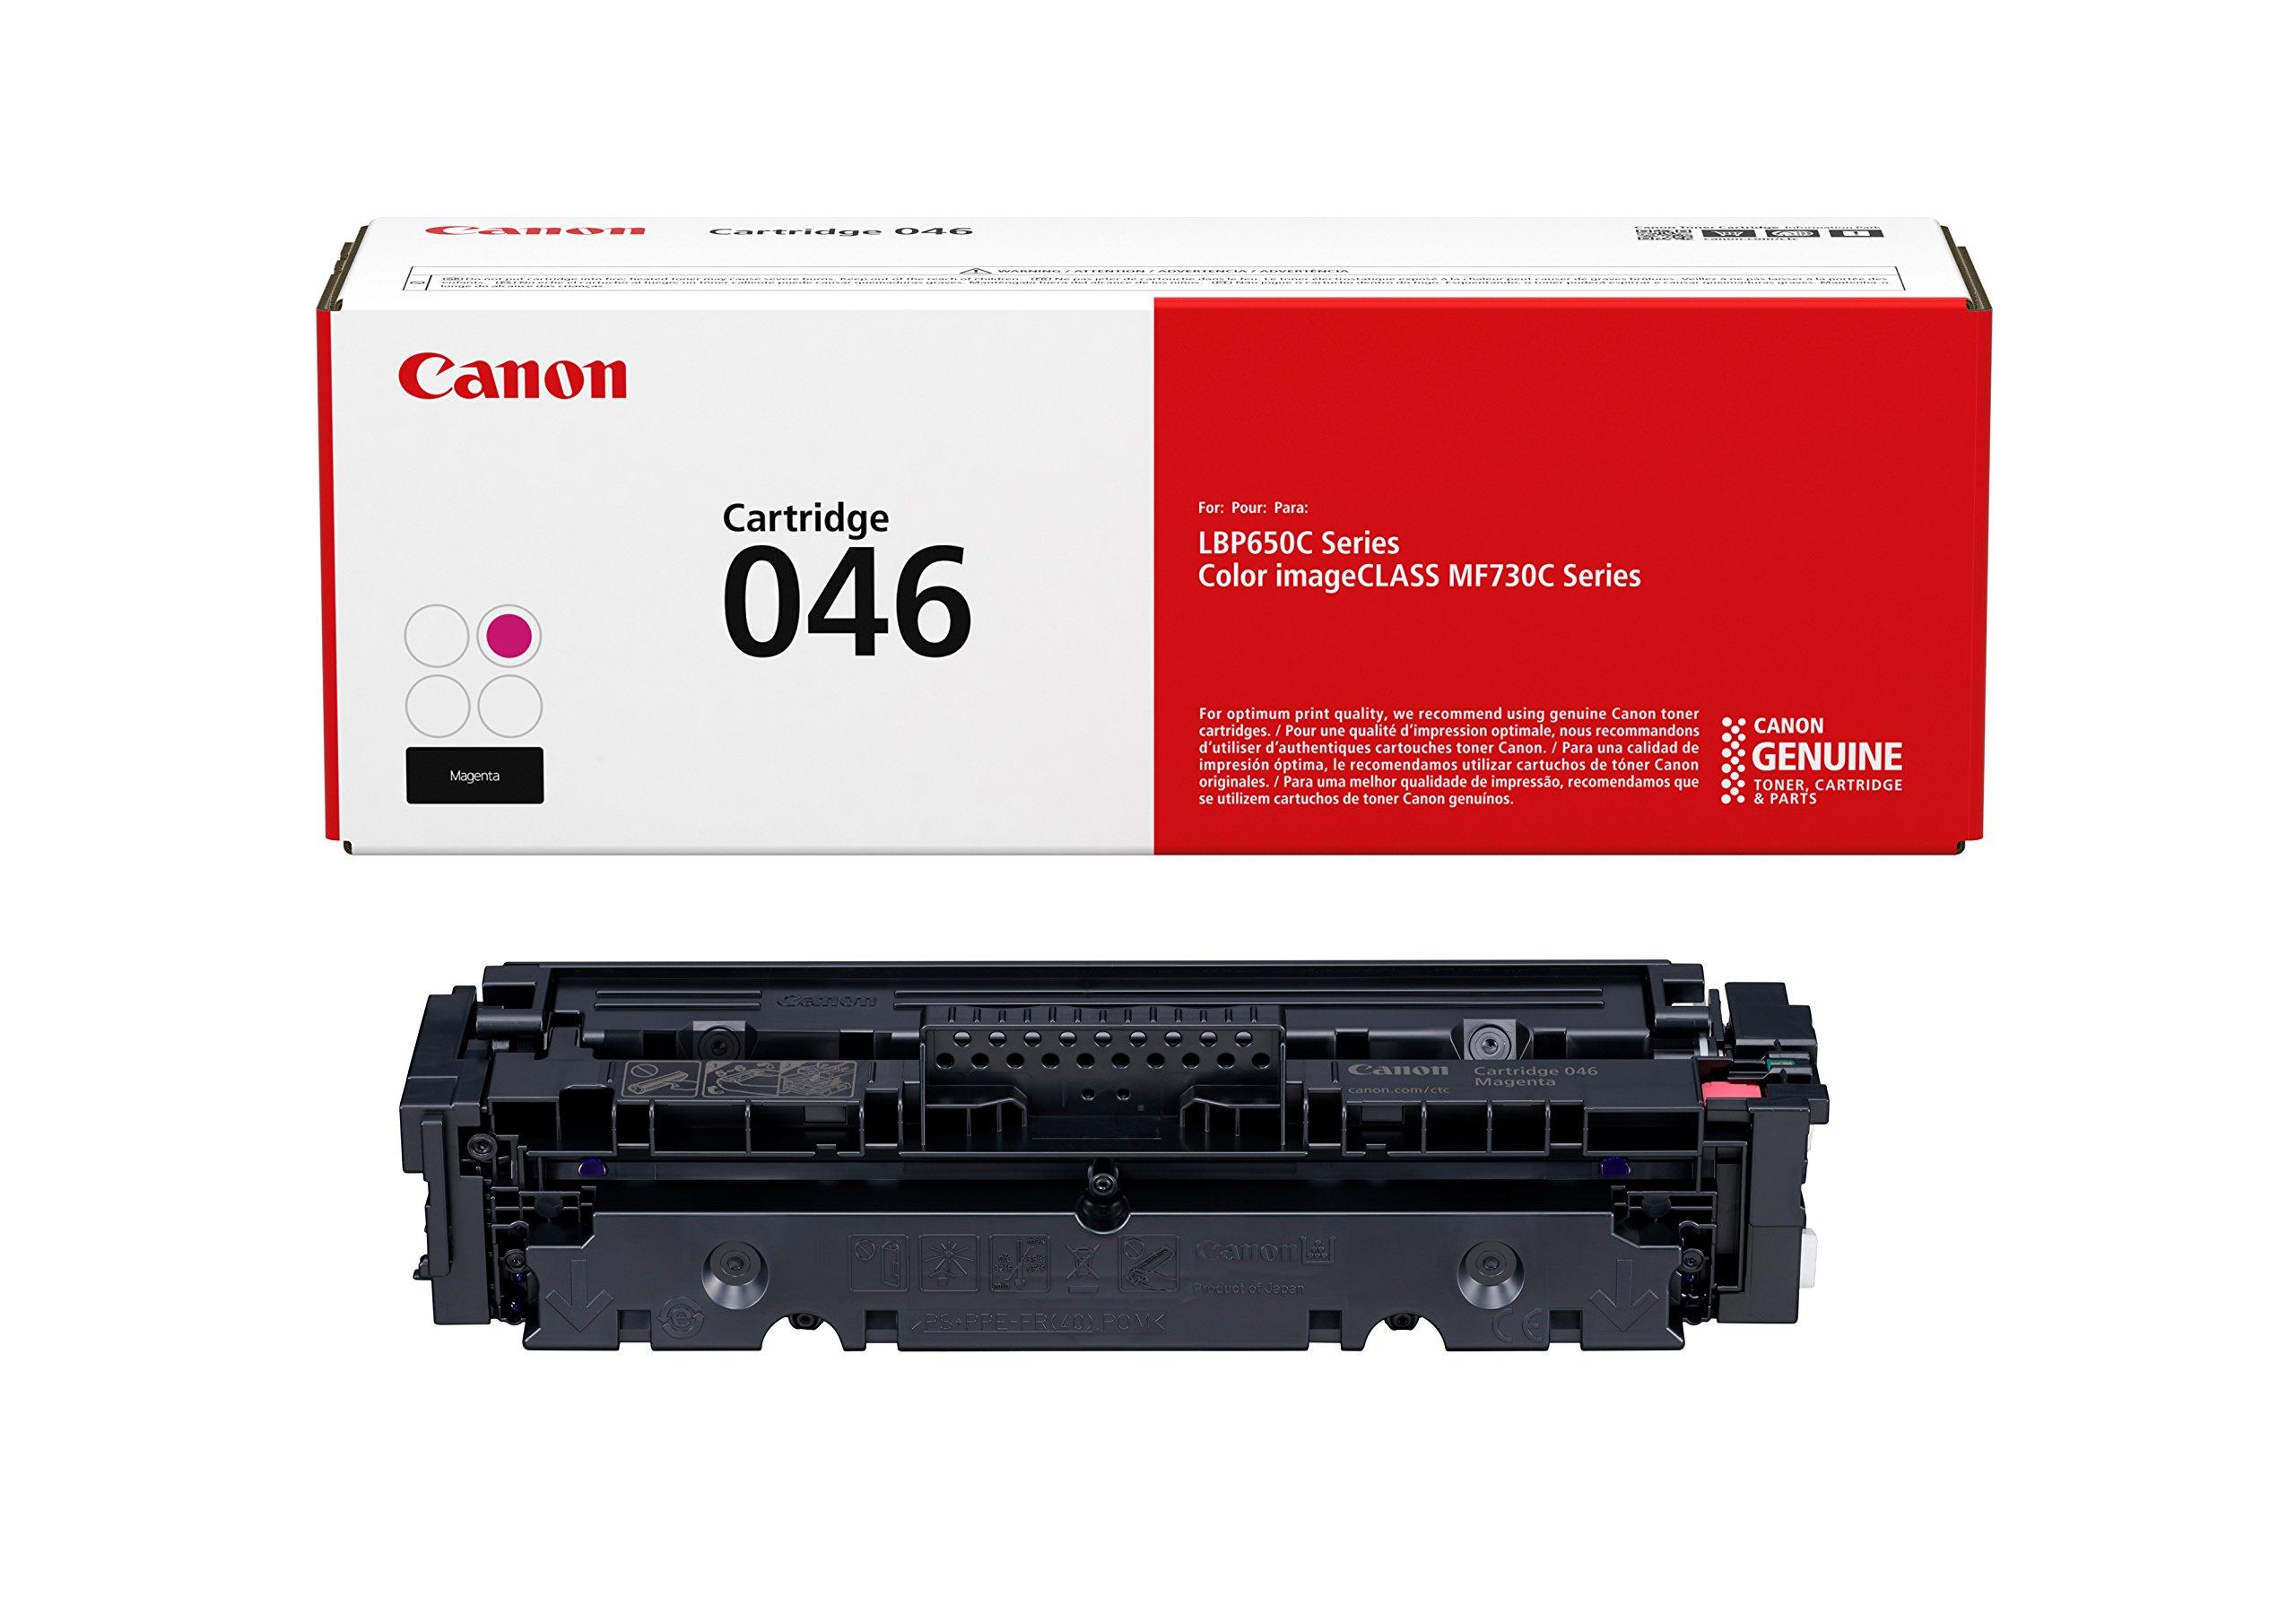 Canon Genuine Toner Cartridge 046 Magenta 1248C001 1 Pack for Canon Color imageCLASS MF735Cdw MF733Cdw MF731Cdw LBP654Cdw Laser Printers